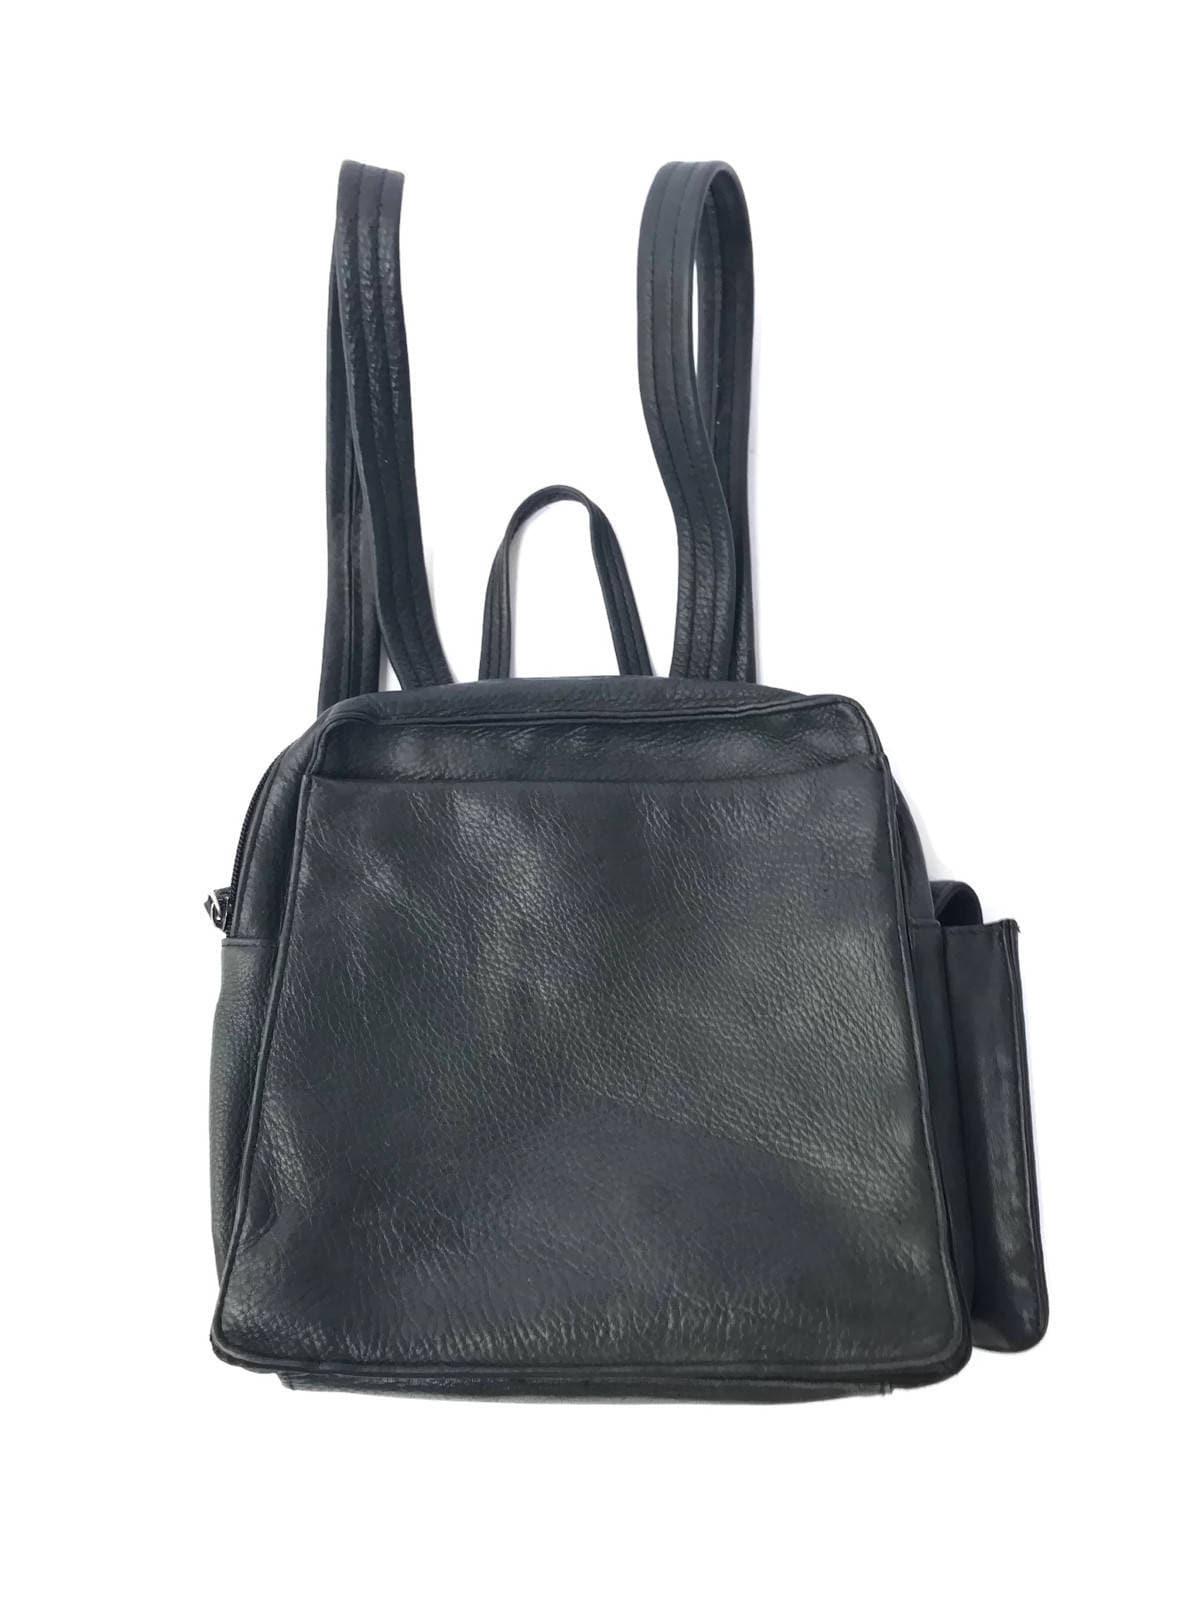 65f20a6c7a Black Leather Backpack Purse Sale- Fenix Toulouse Handball